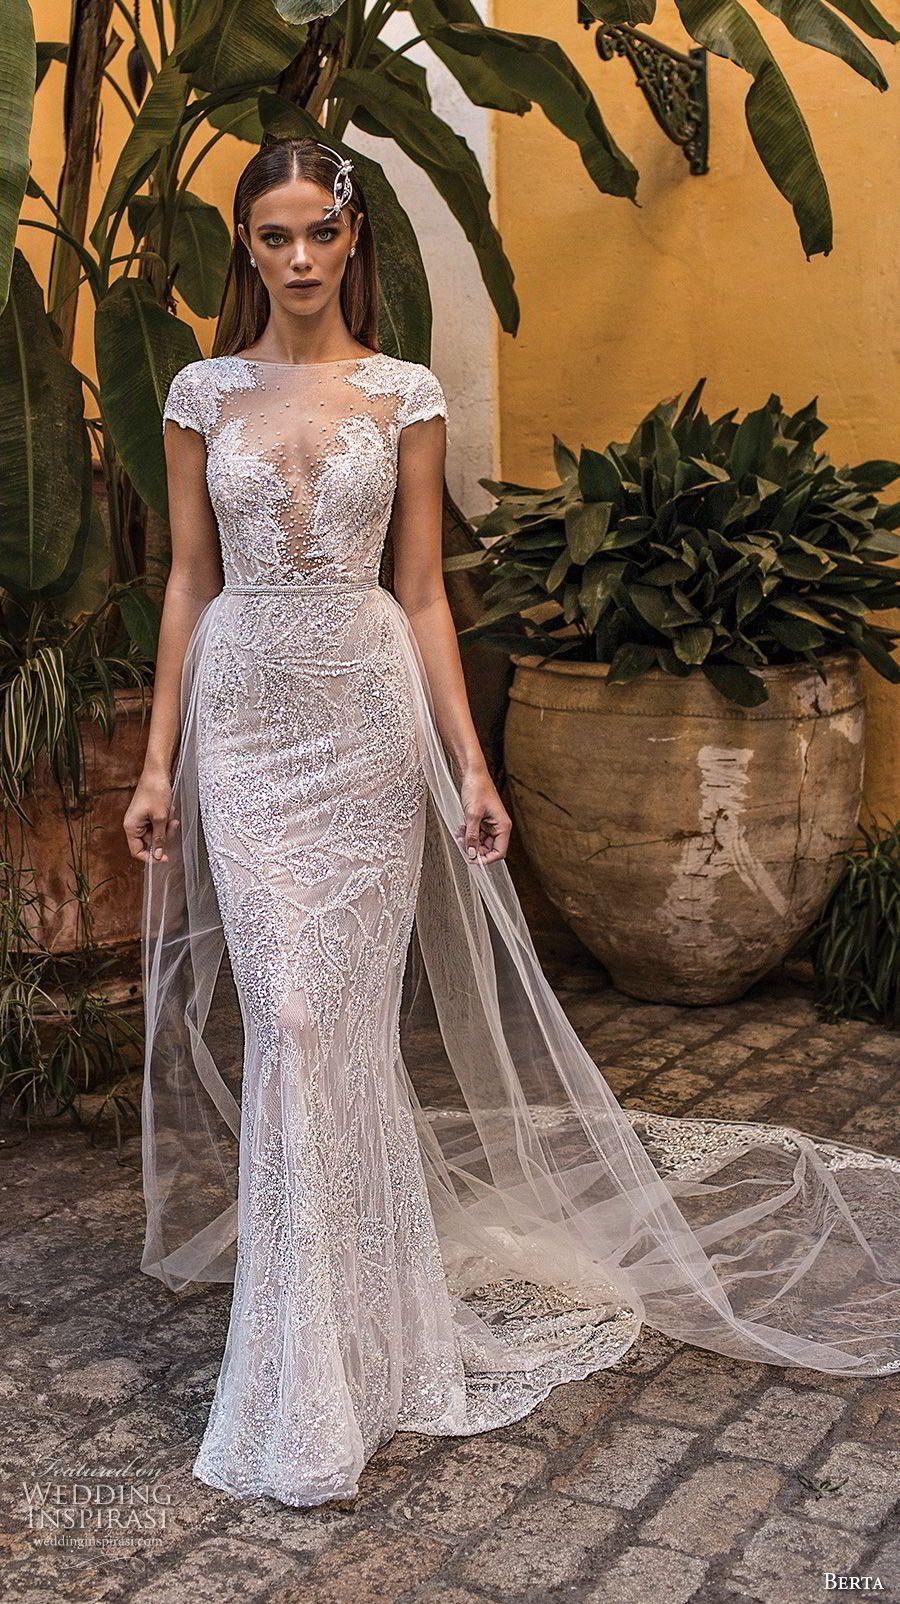 Berta fall wedding dresses illusions neckline and wedding dress